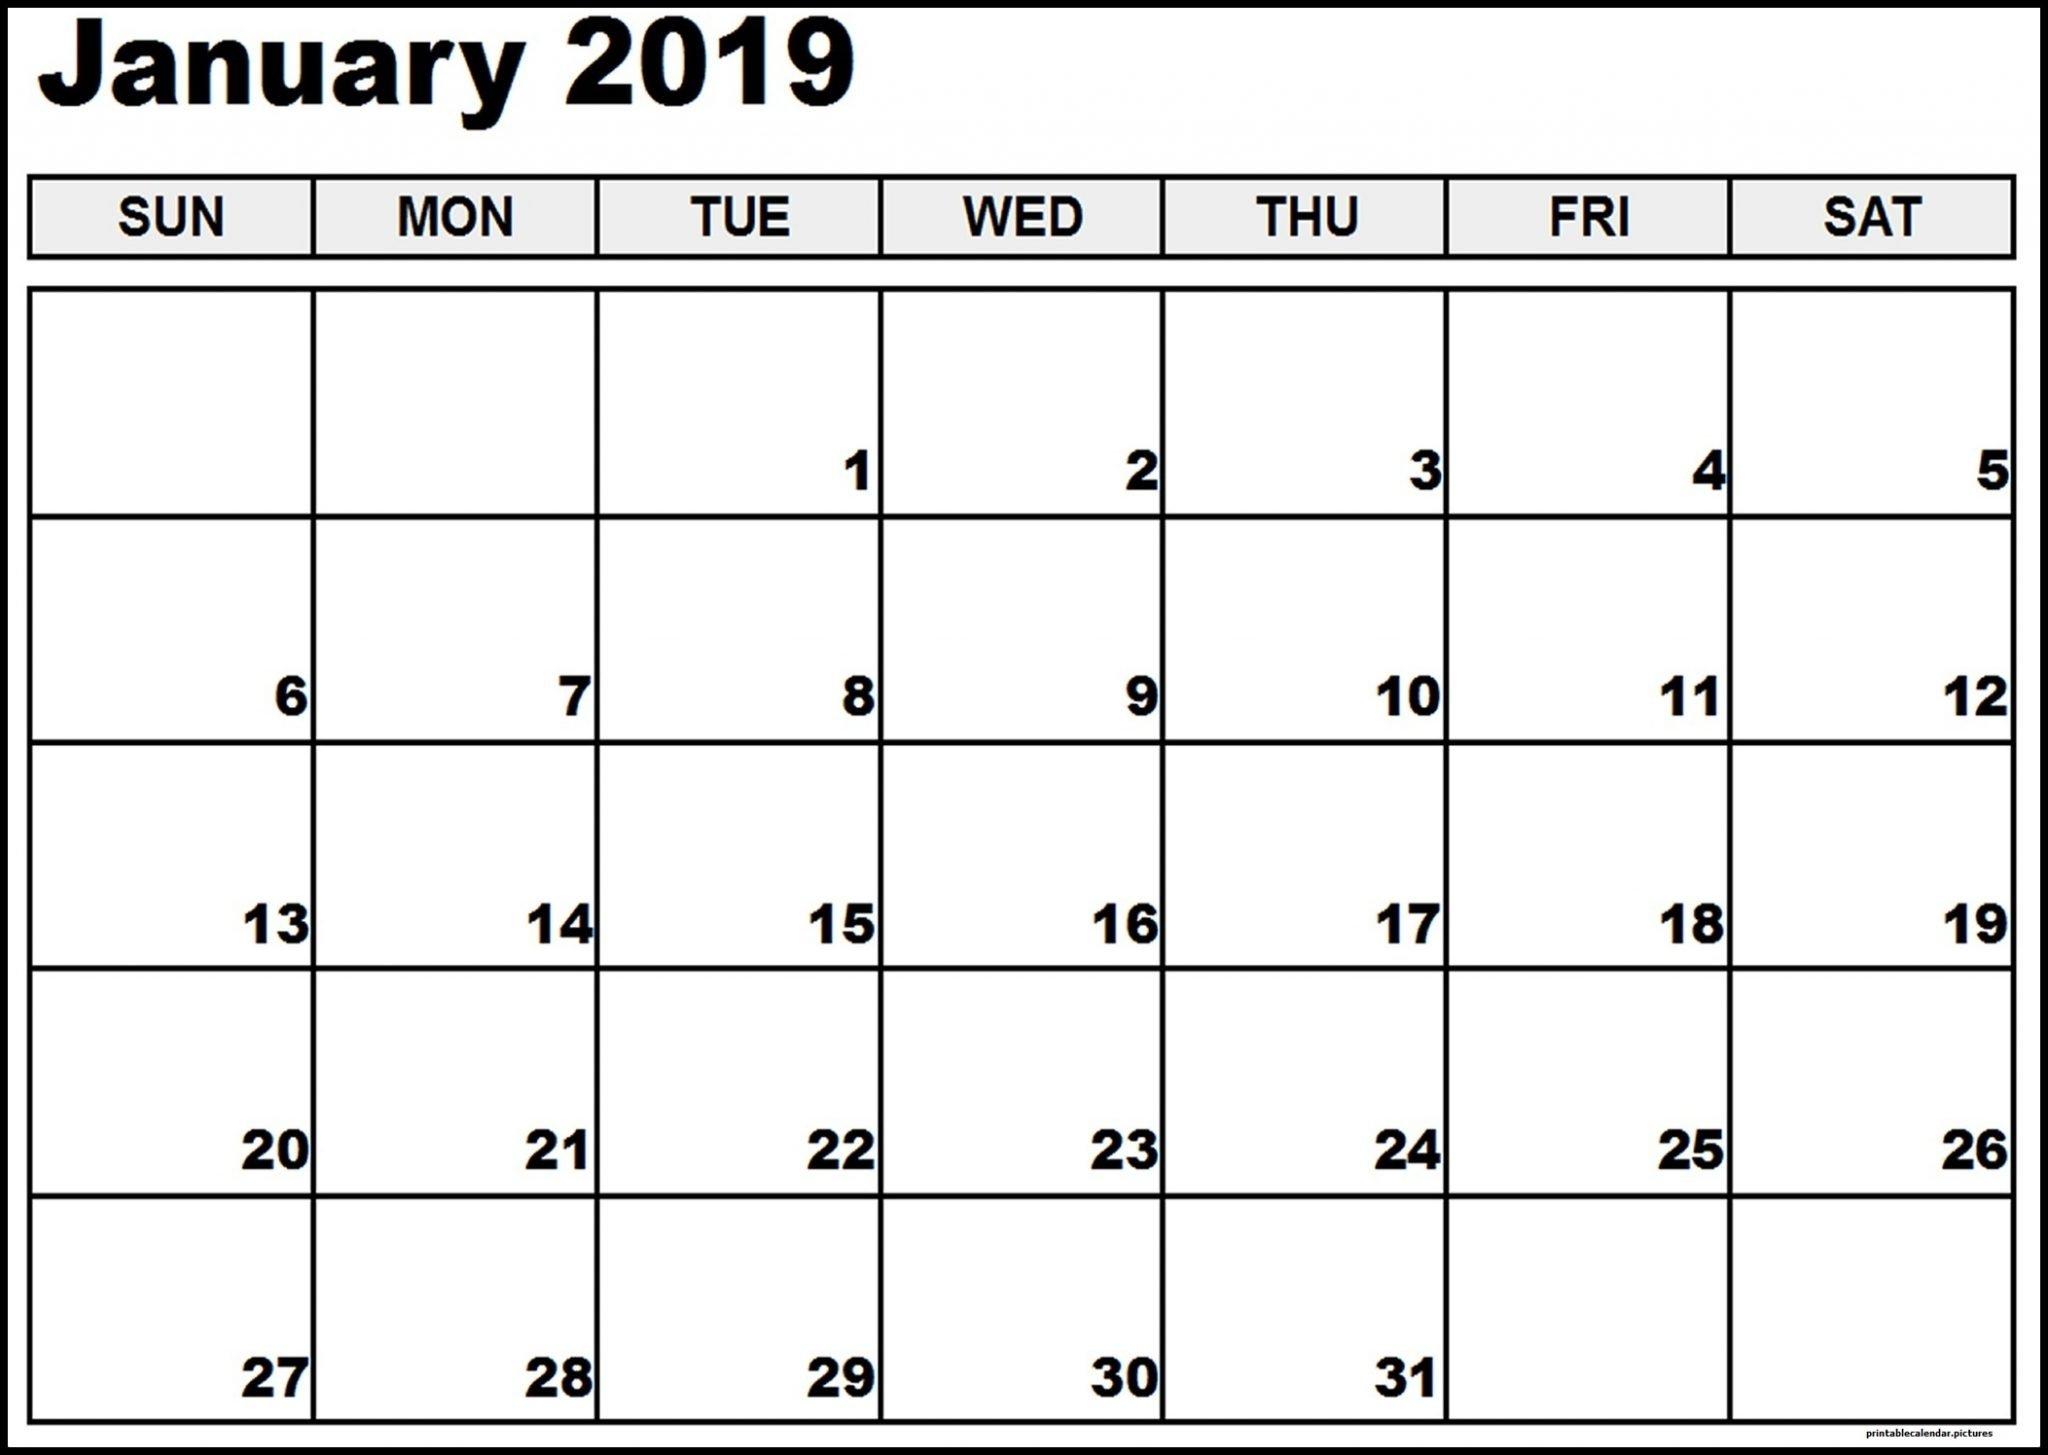 Vertex January Calendar 2019 Printable - Free Printable Calendar Calendar 2019 Vertex